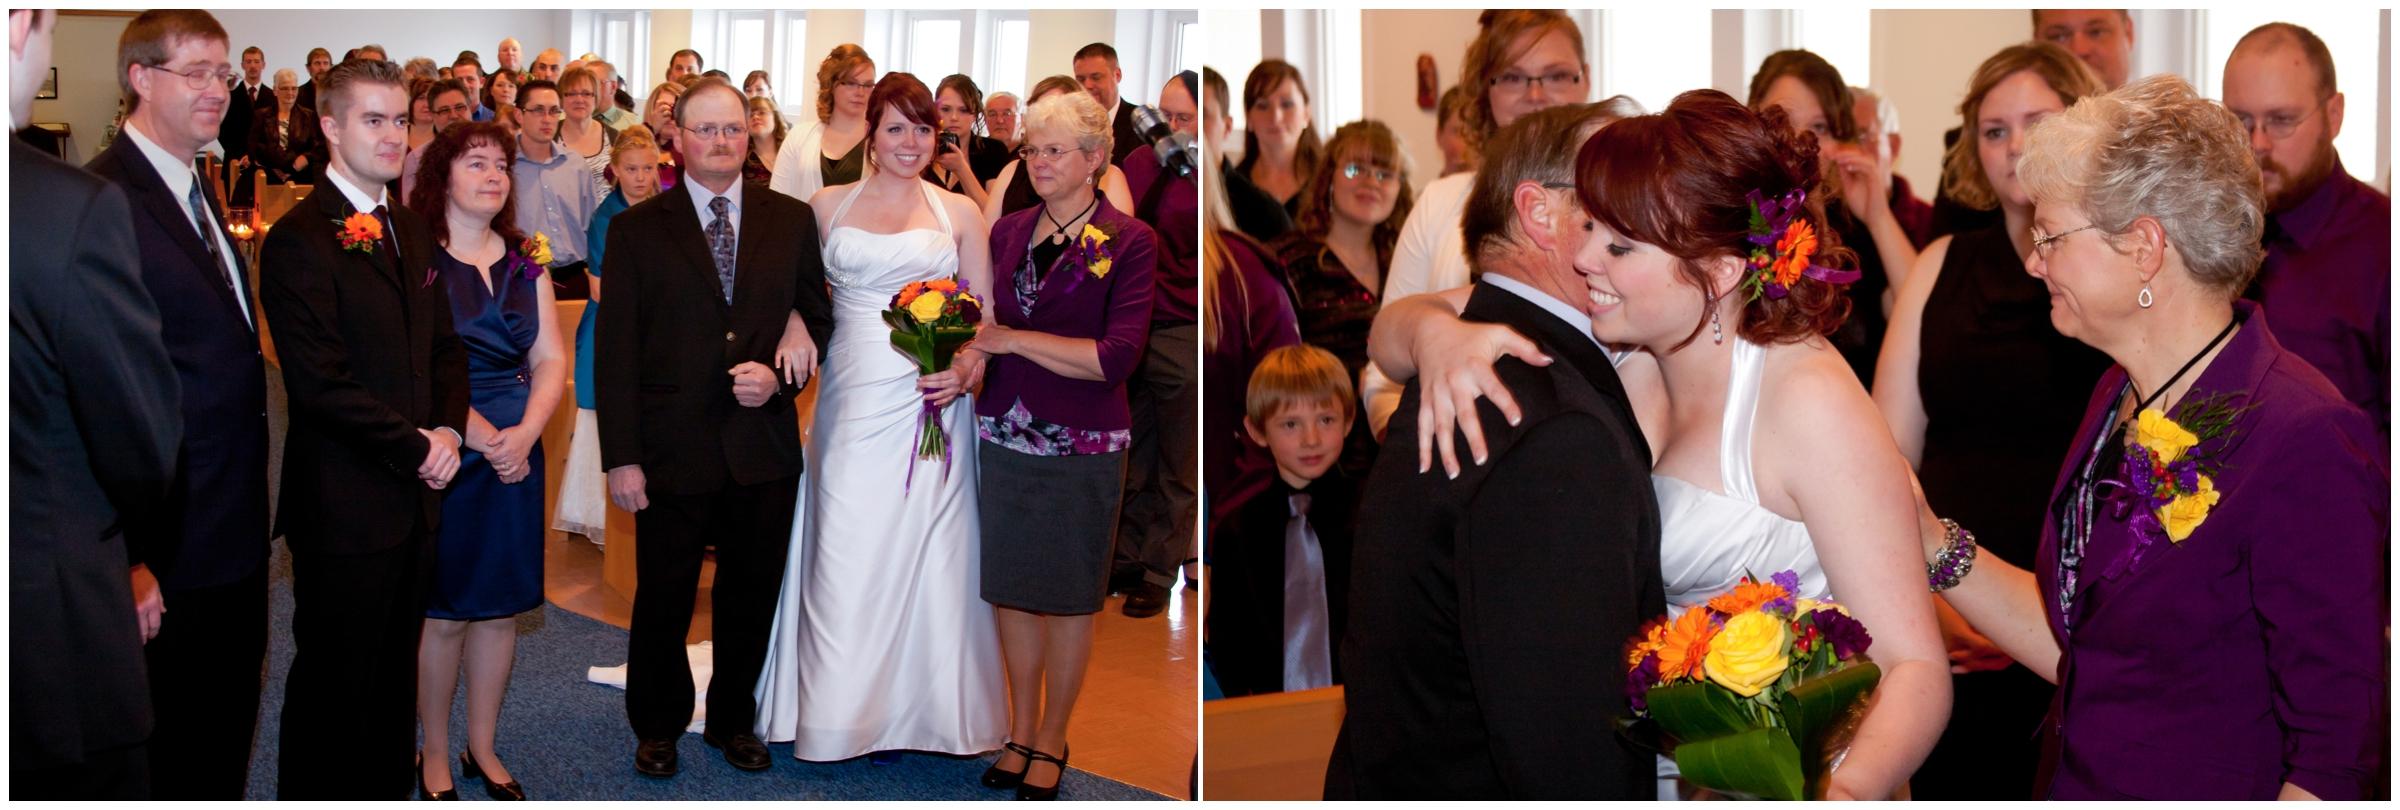 Bree and Tyler Wedding_0030.jpg